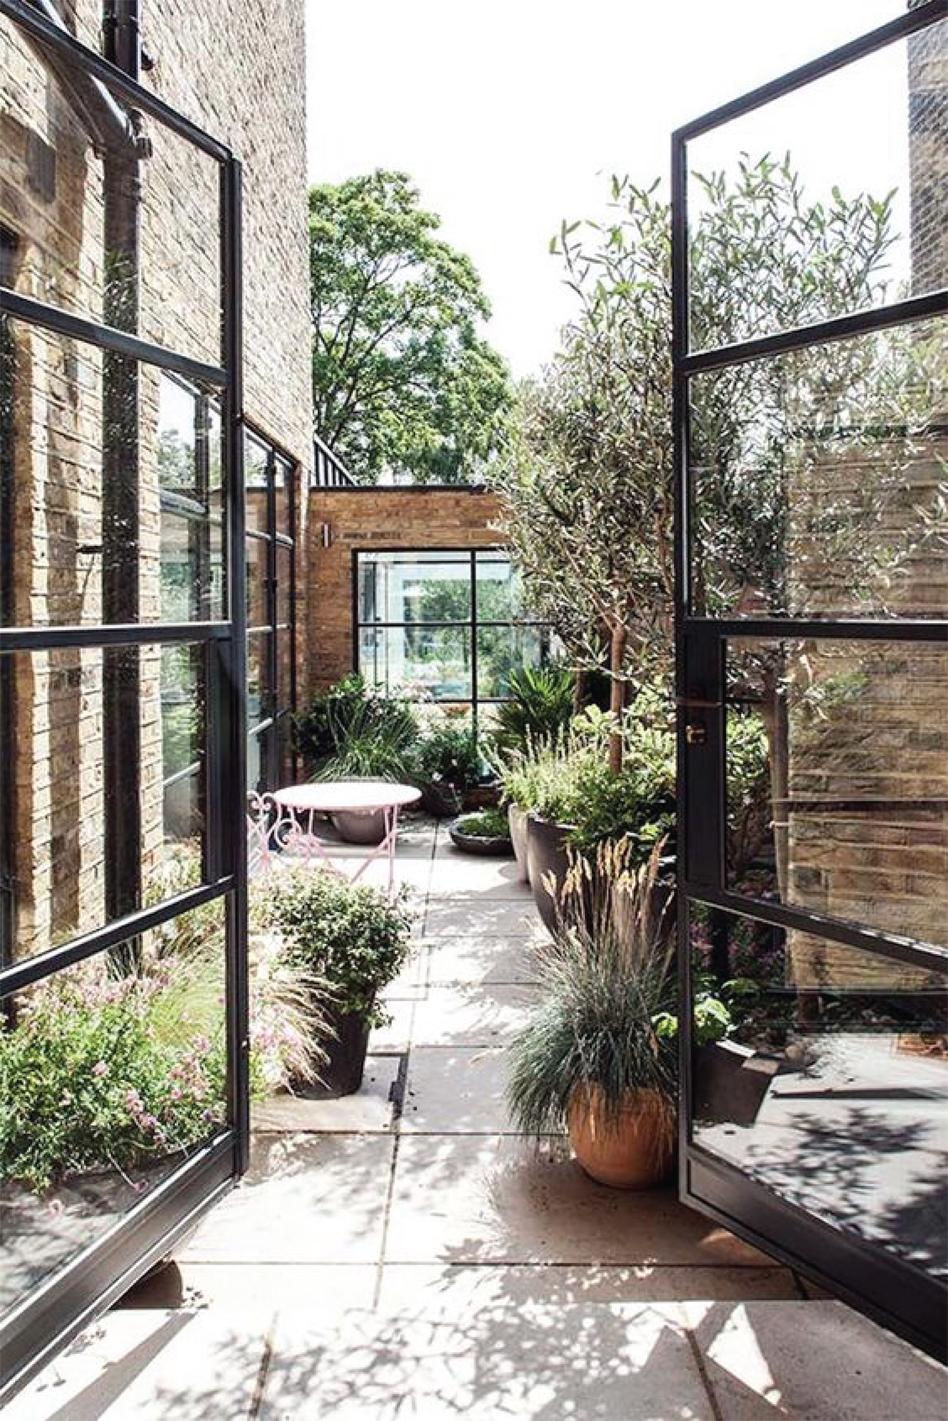 Statement Gardens: glass and steel garden door entrance | Akin Design Studio Blog